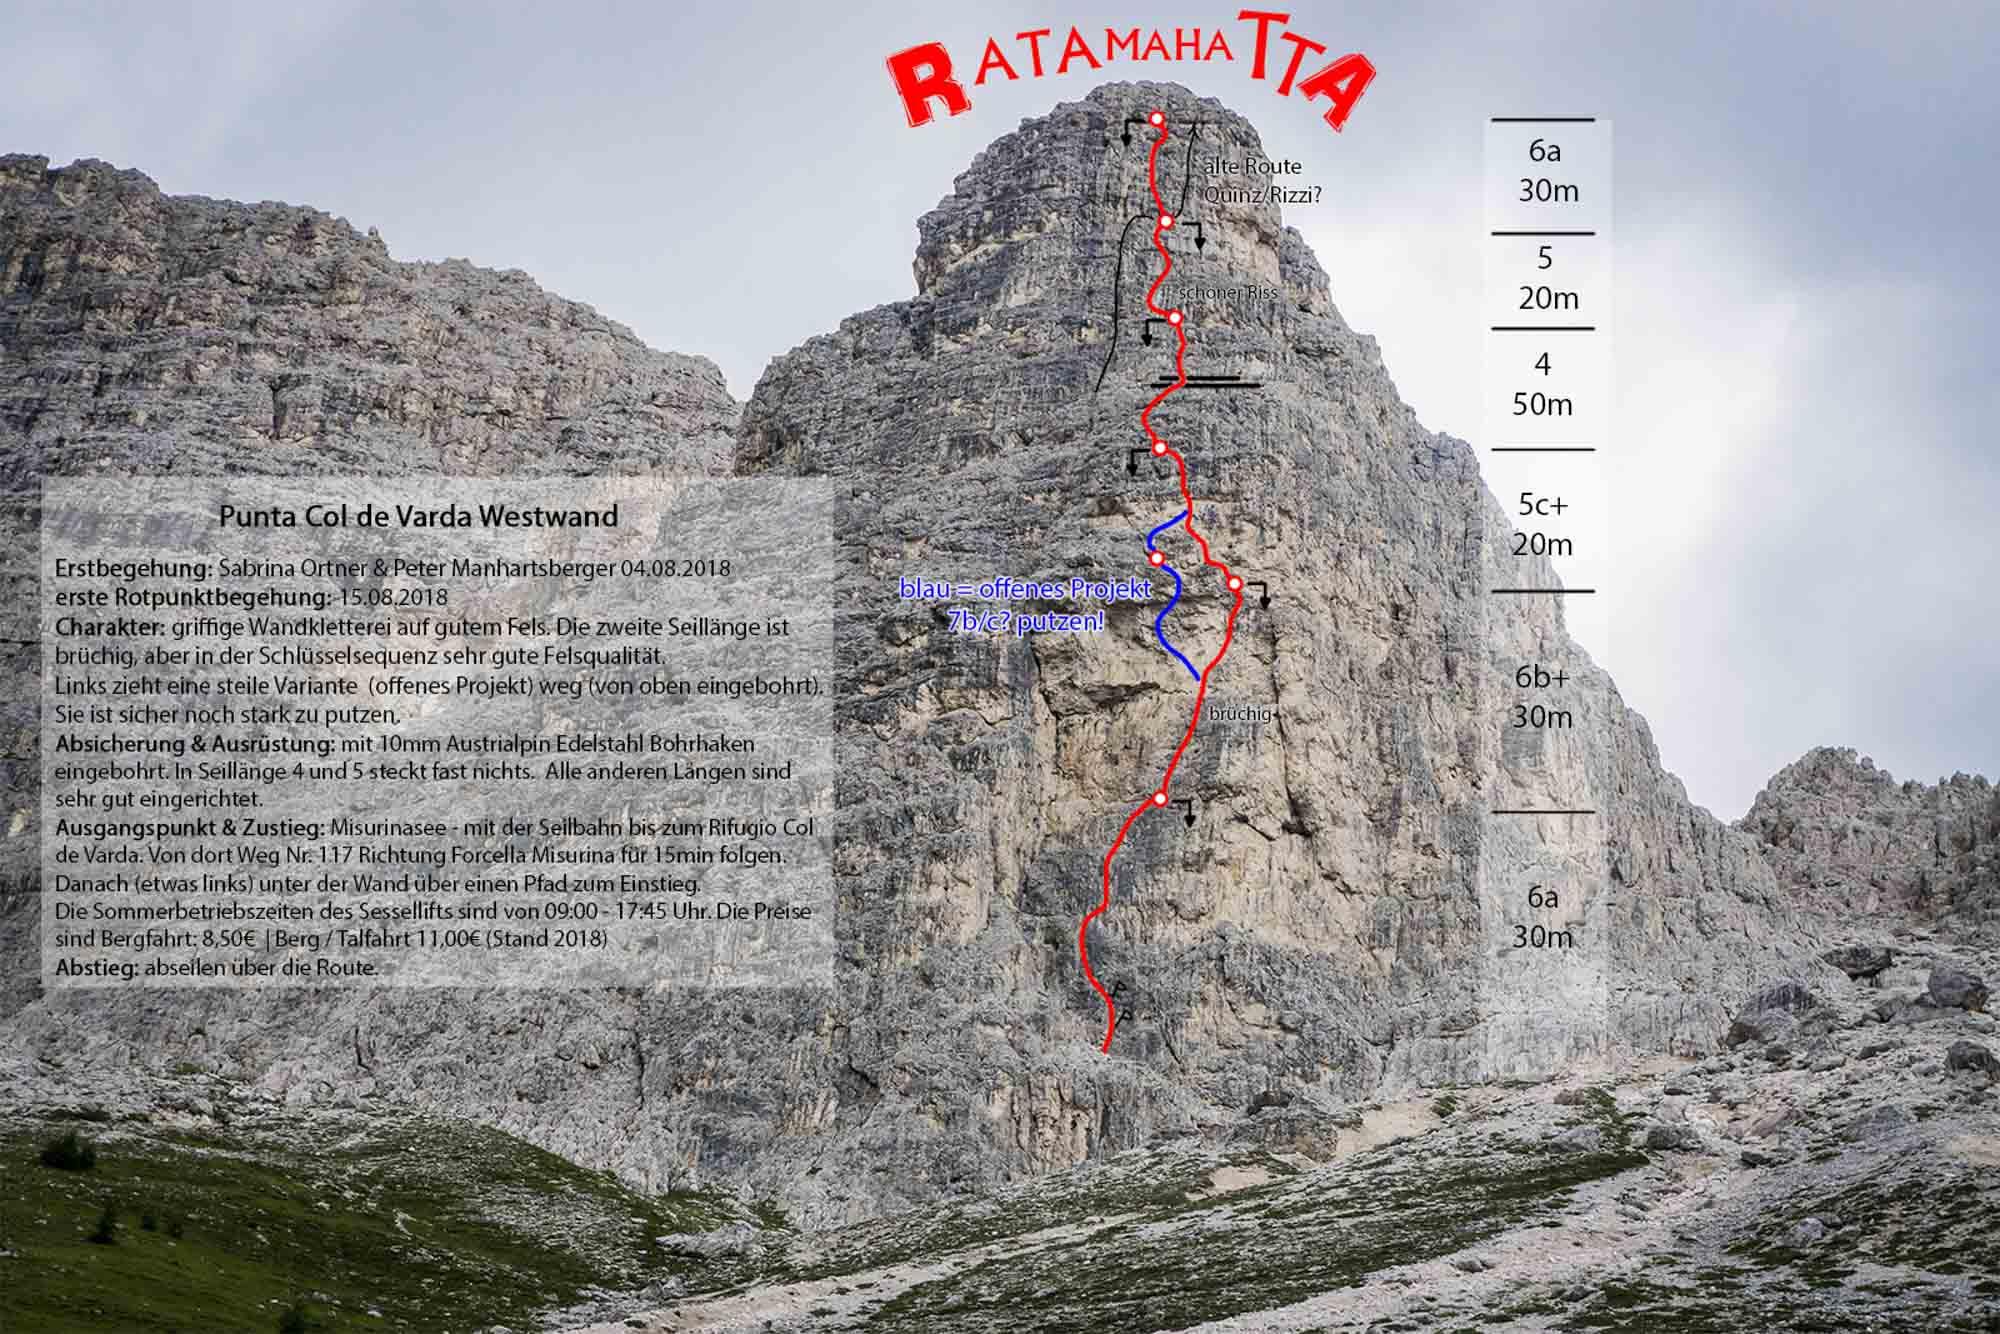 Ratamahatta Topo © Peter Manhartsberger und Sabrina Ortner